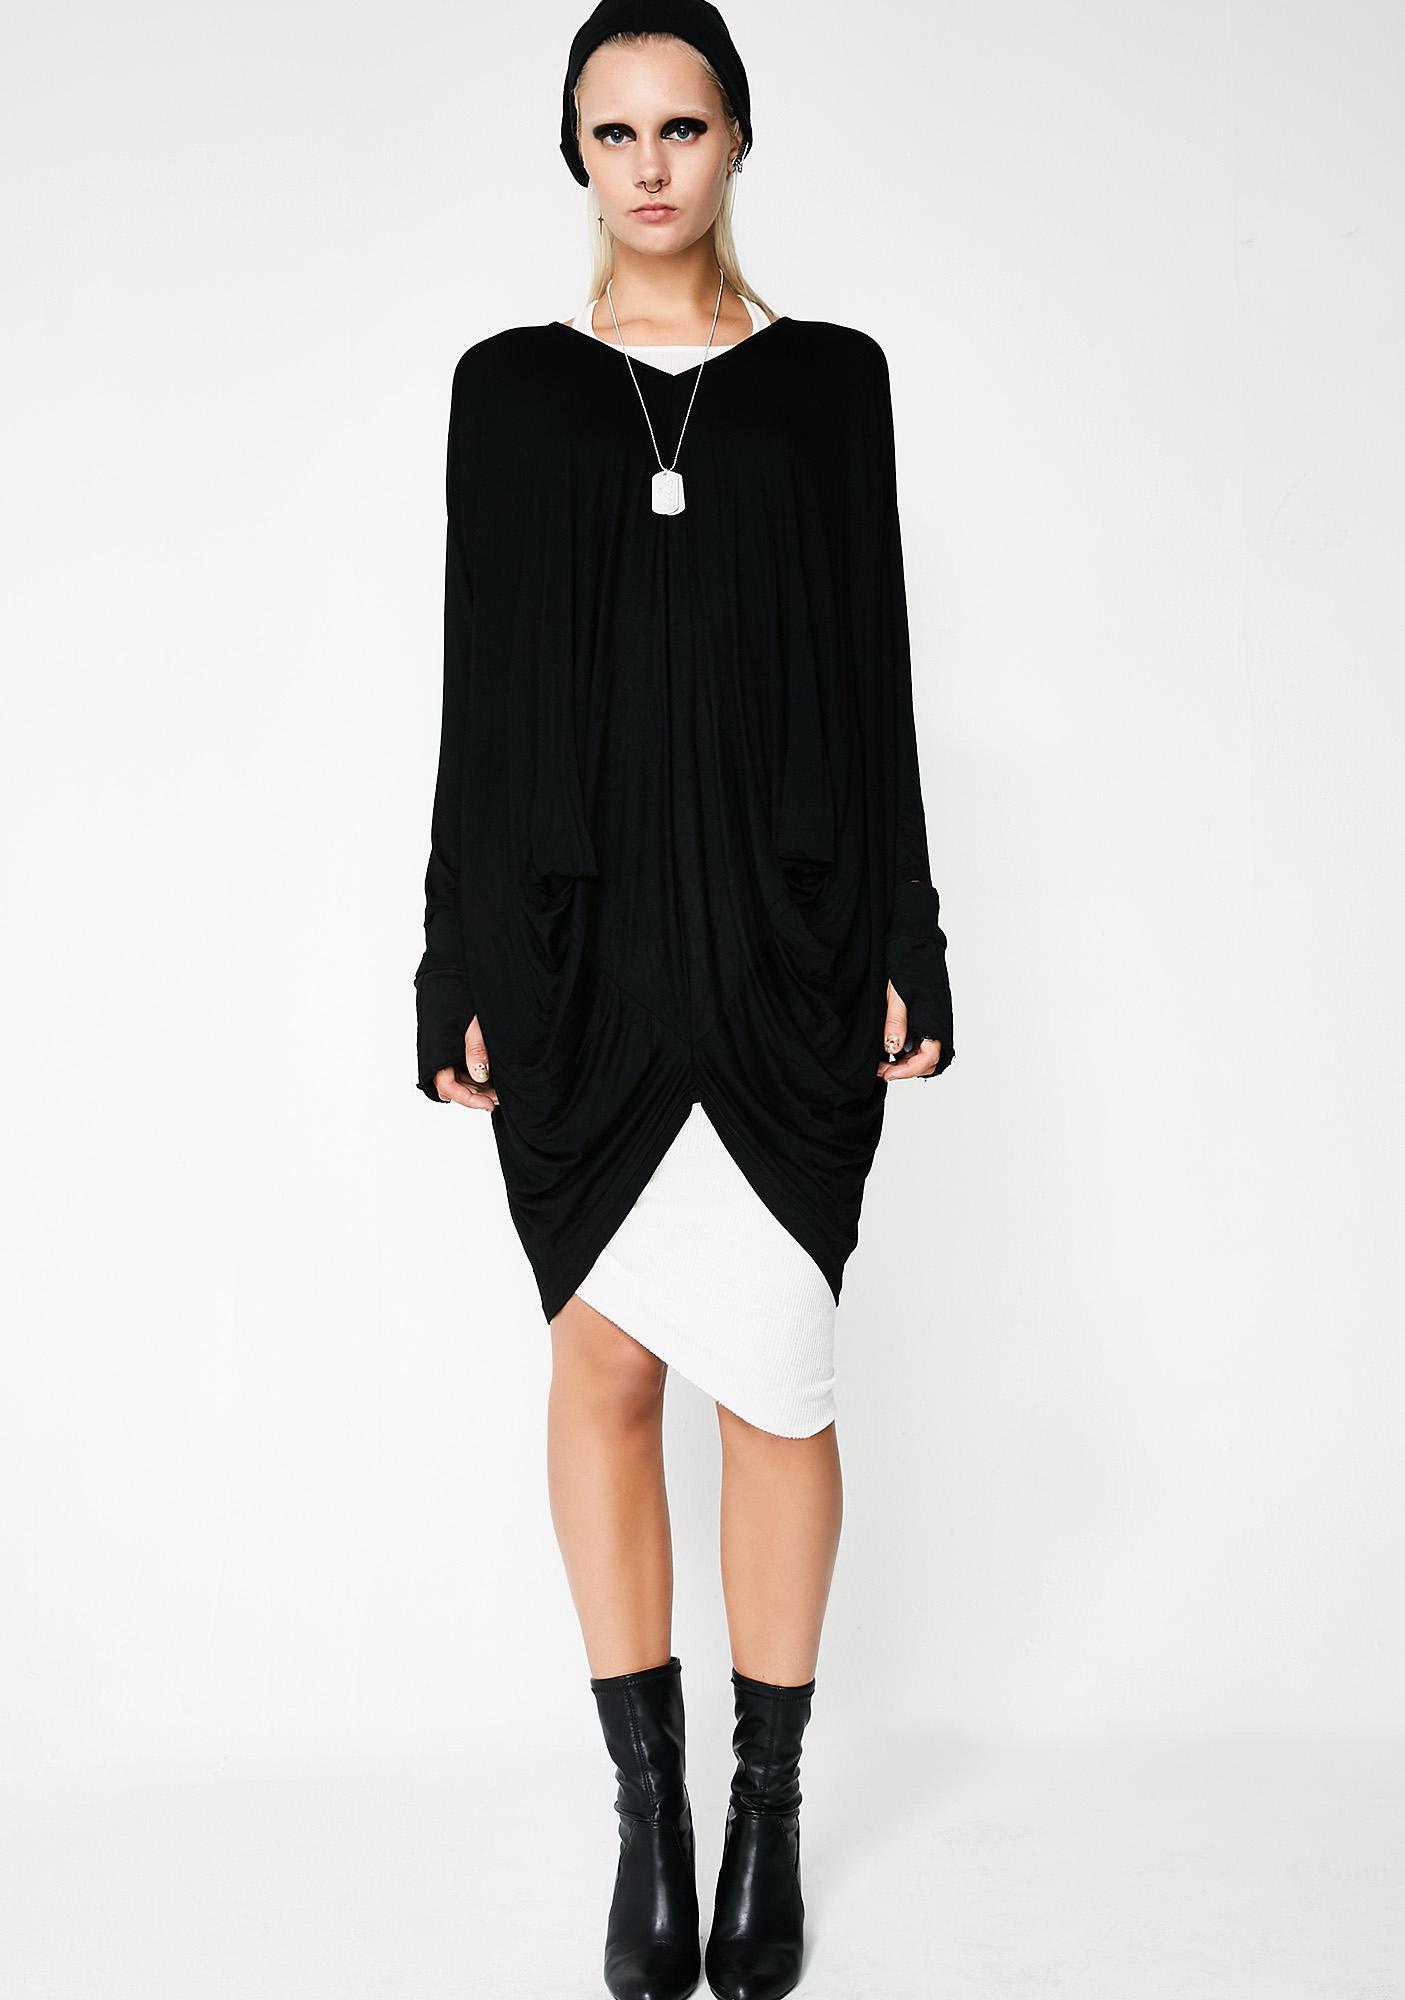 MNML Nova Long Sleeve Blouse